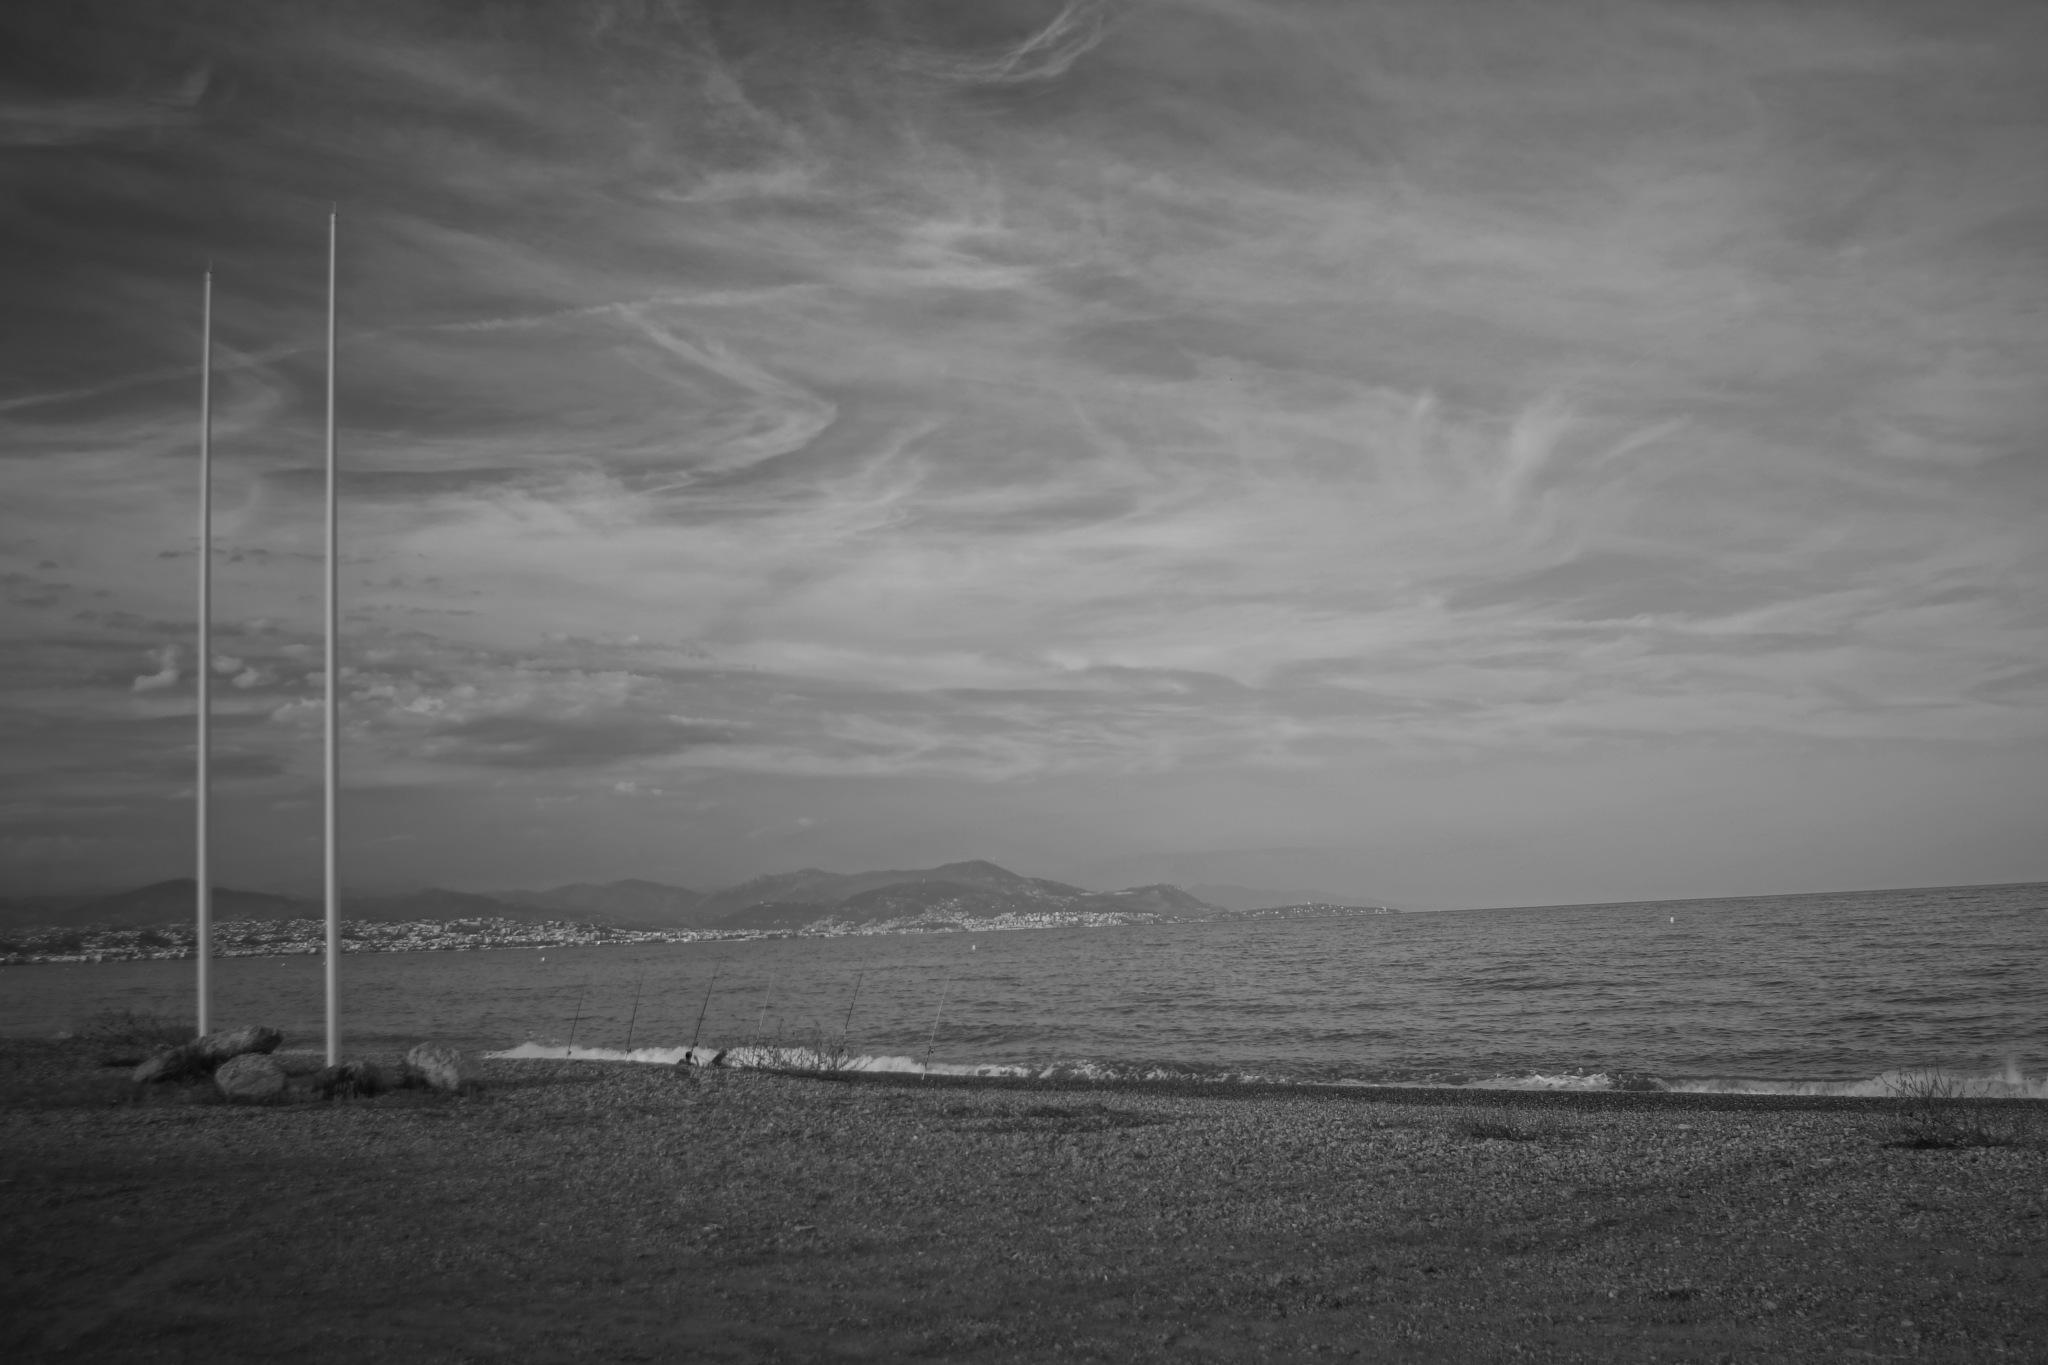 Black and White Beach World by erol.antz